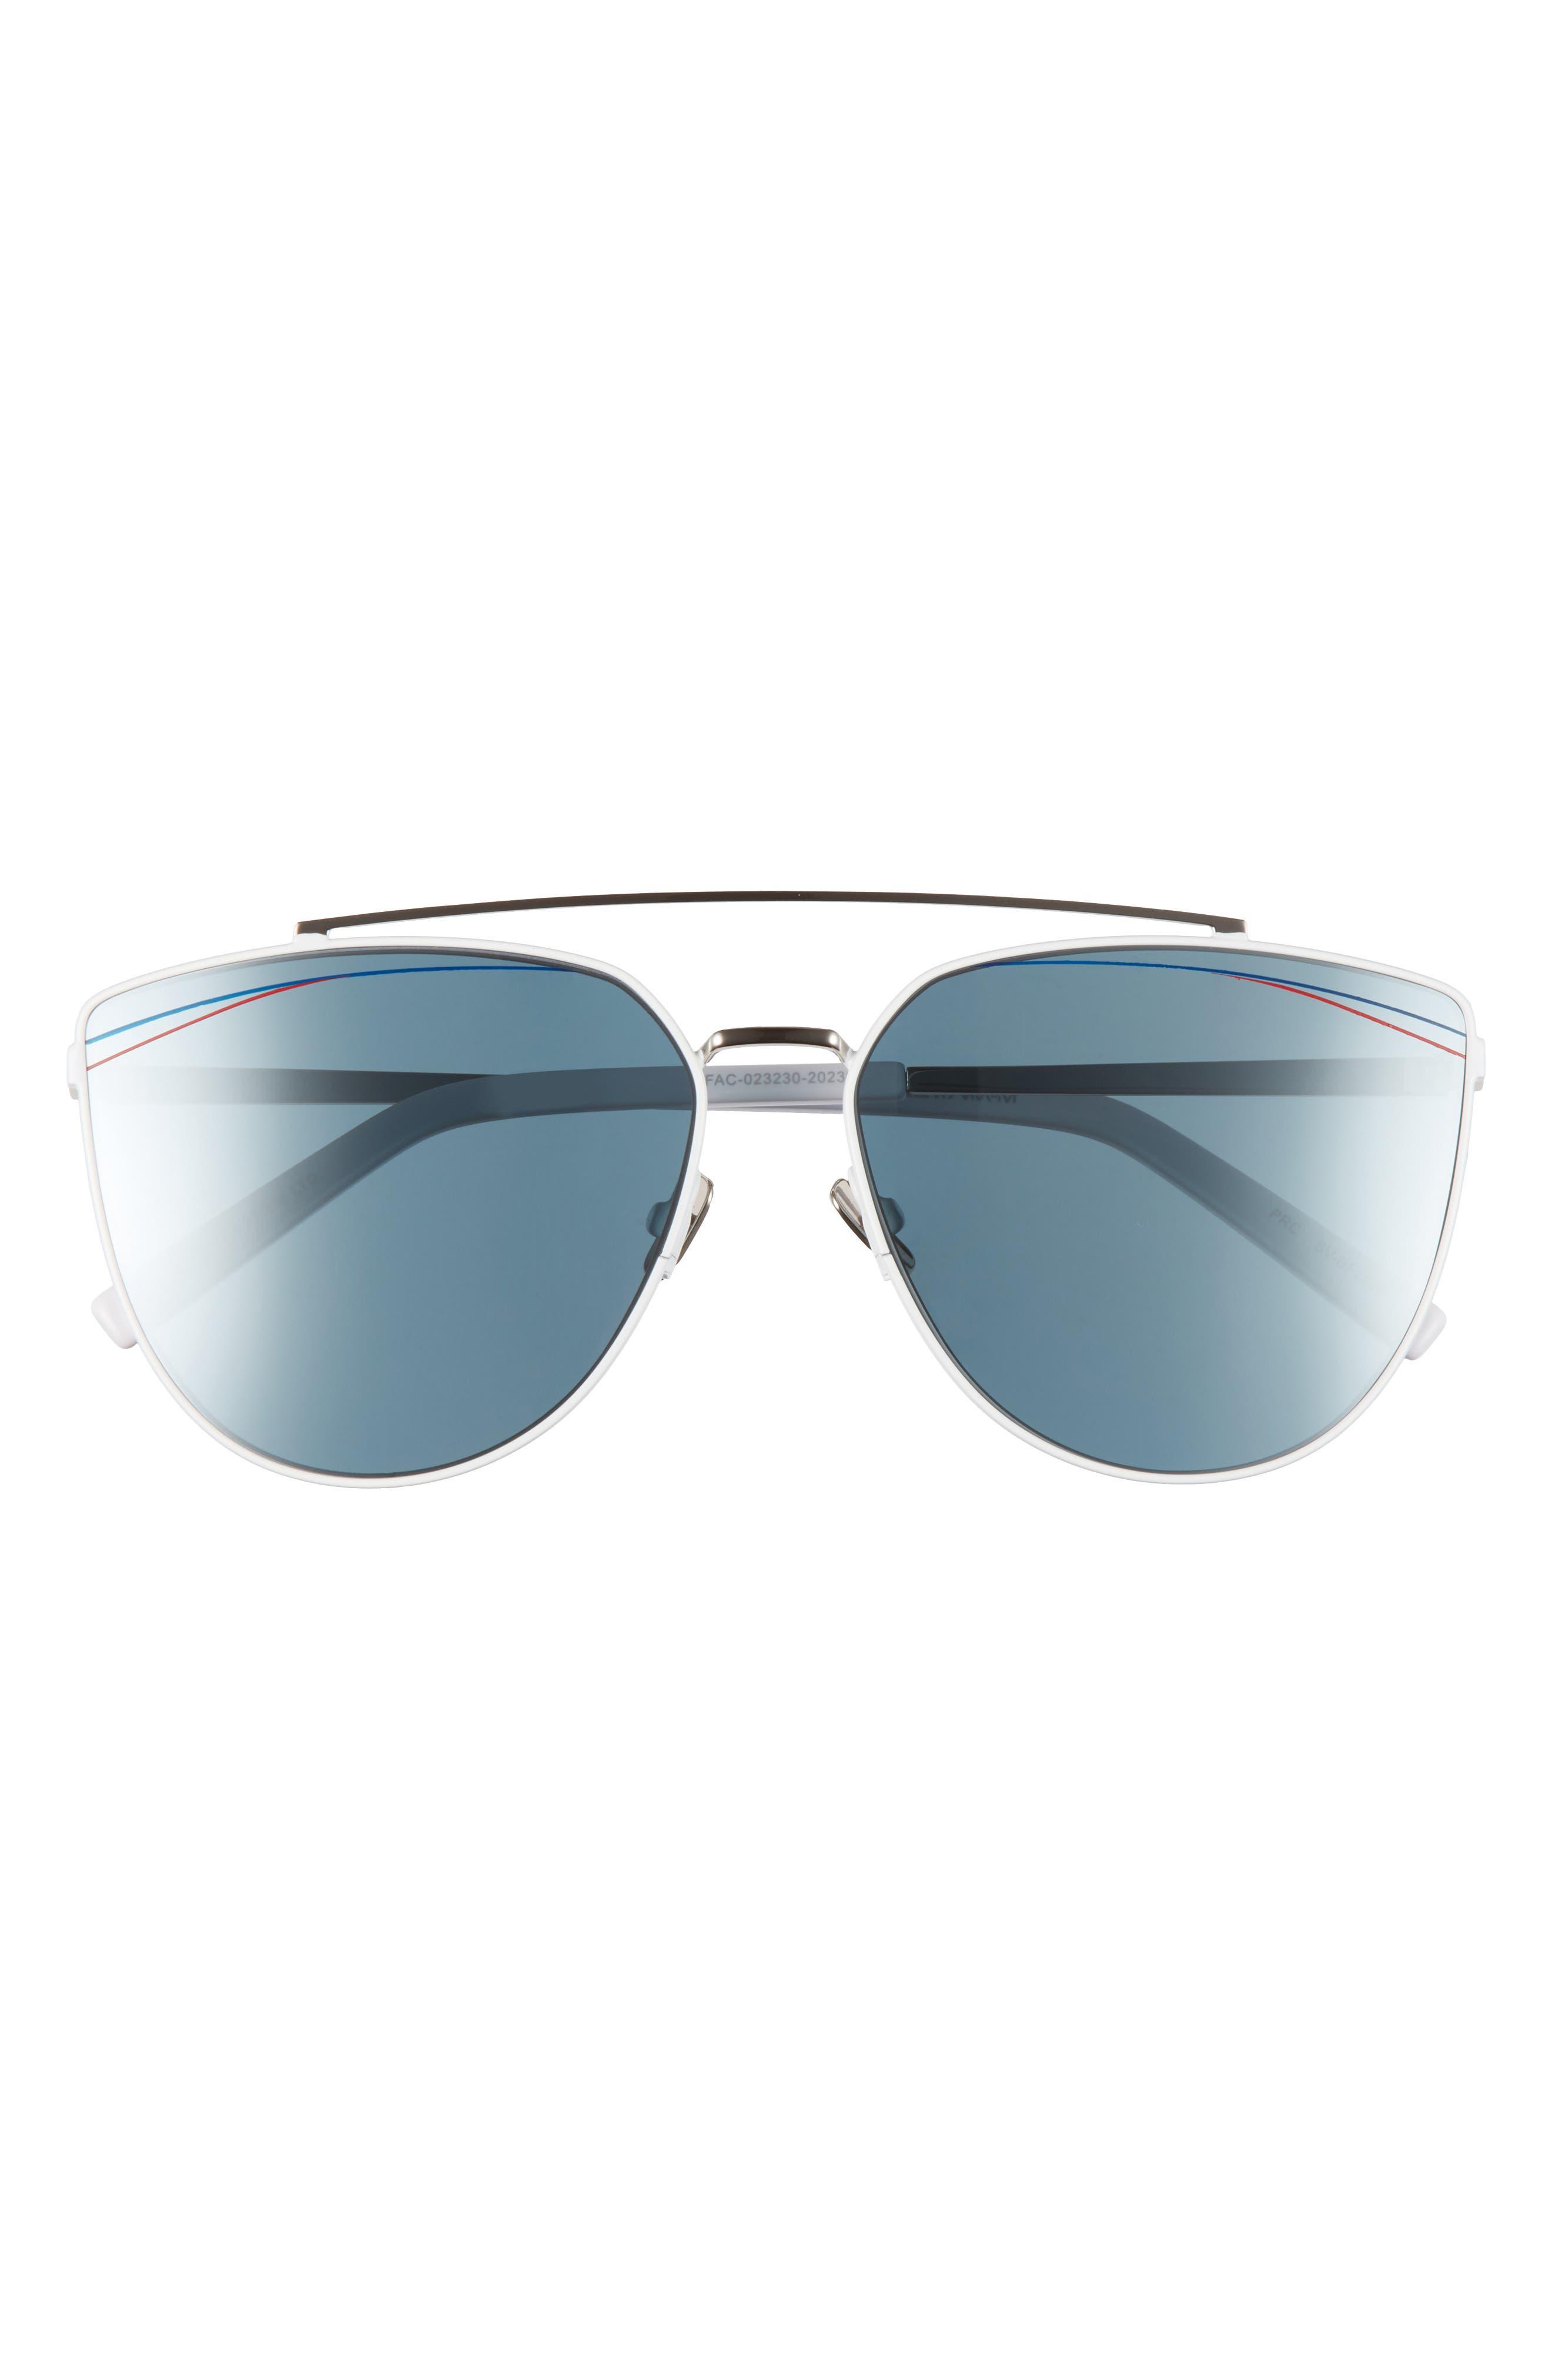 X Star Wars(TM) R2-D2 62mm Polarized Oversize Aviator Sunglasses